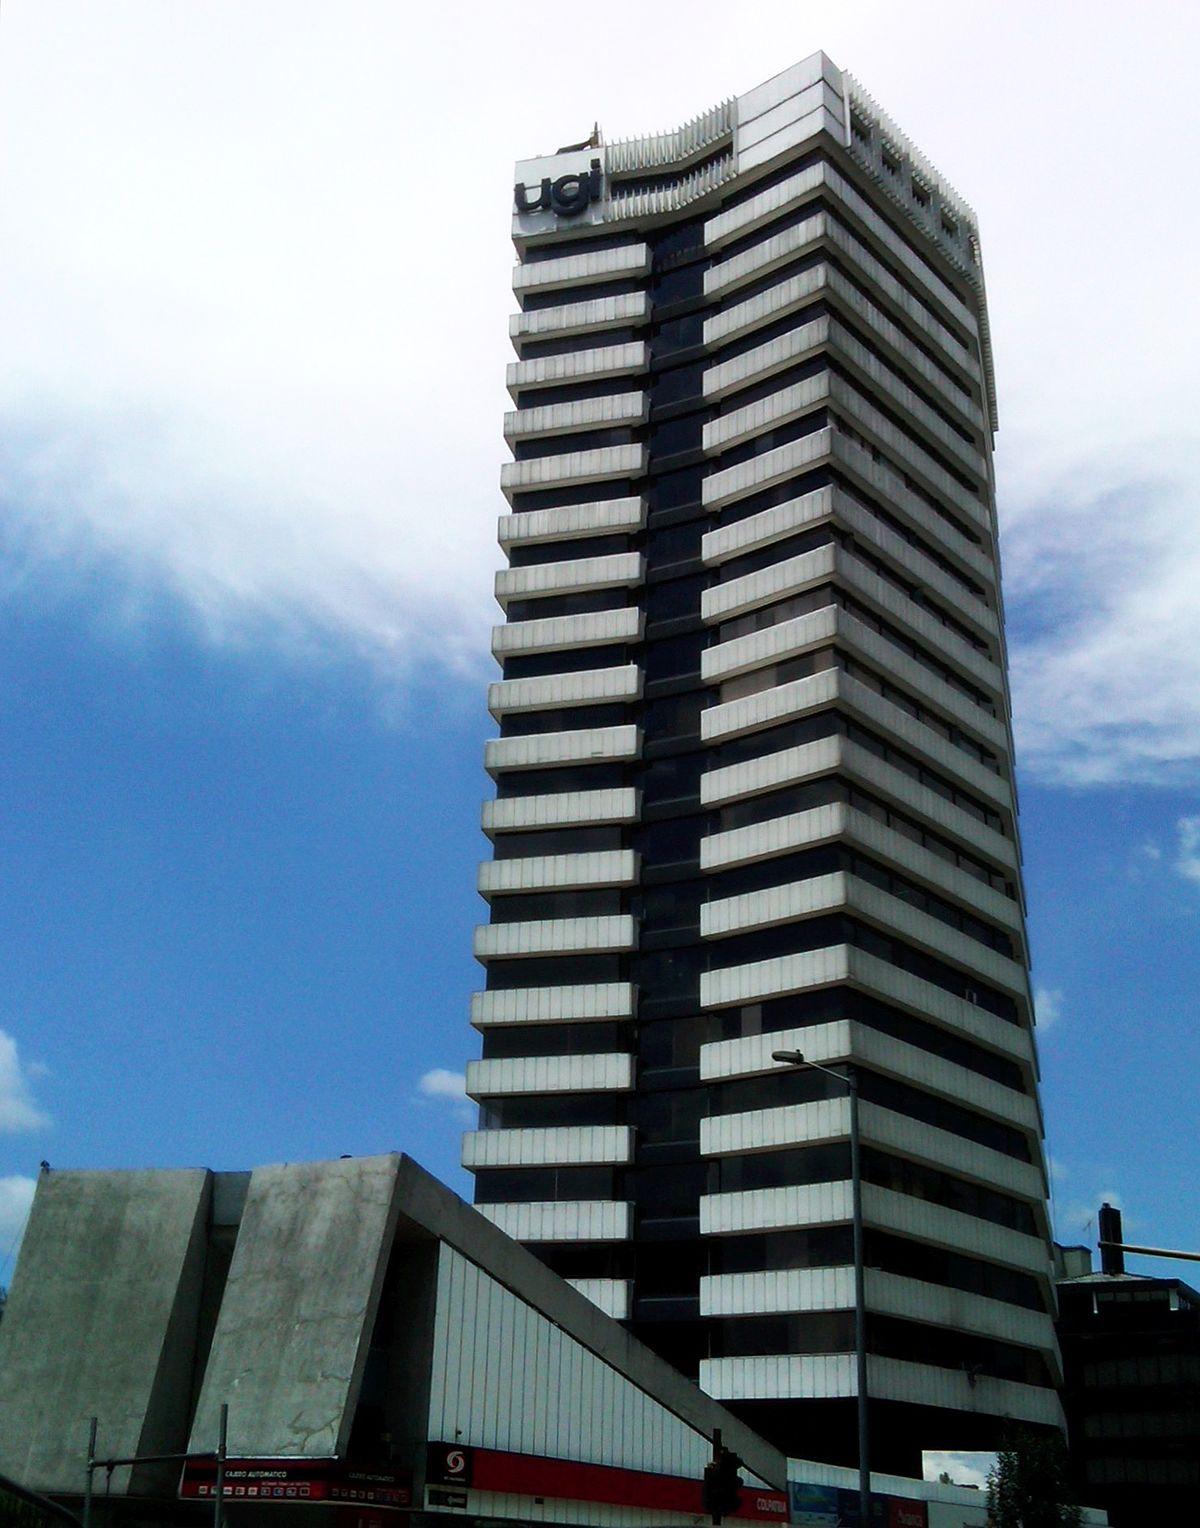 Edificio ugi wikipedia la enciclopedia libre - Altura de un piso ...